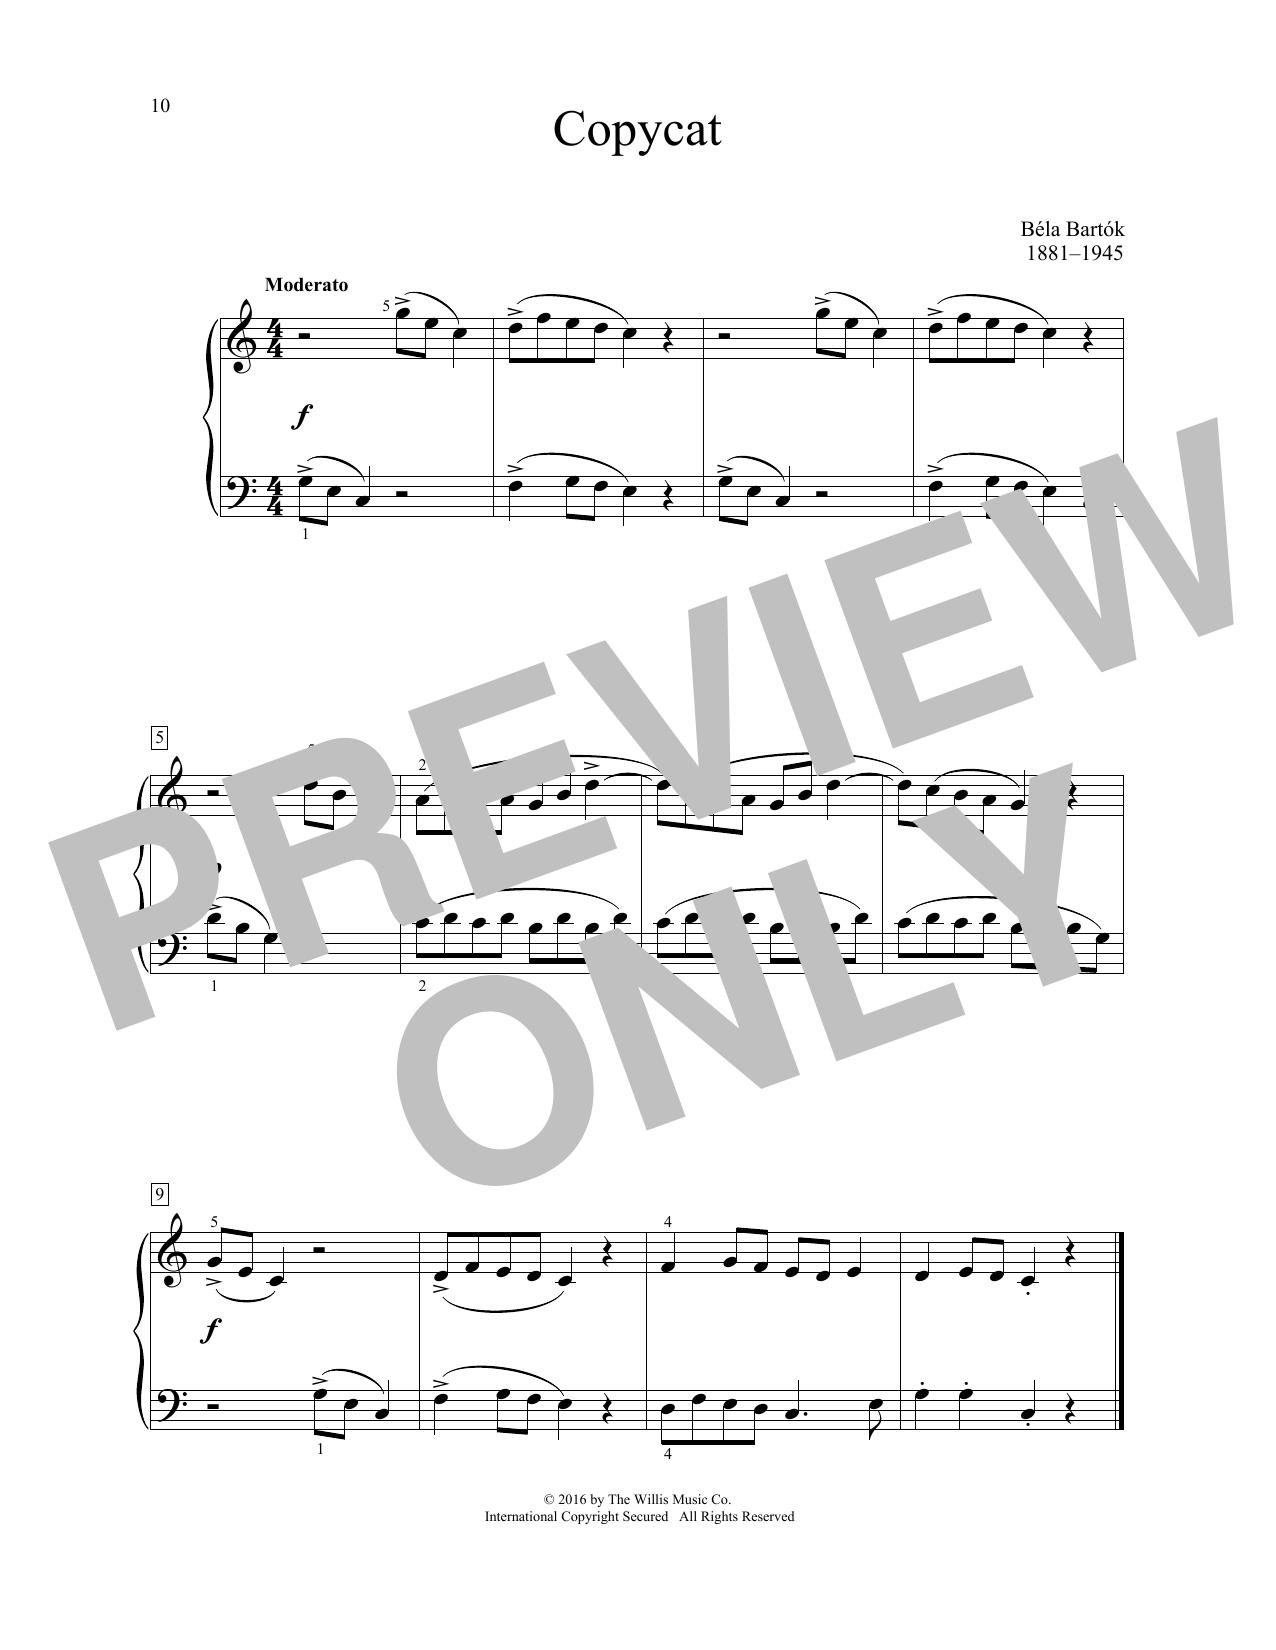 Bela Bartok Copycat sheet music notes and chords. Download Printable PDF.